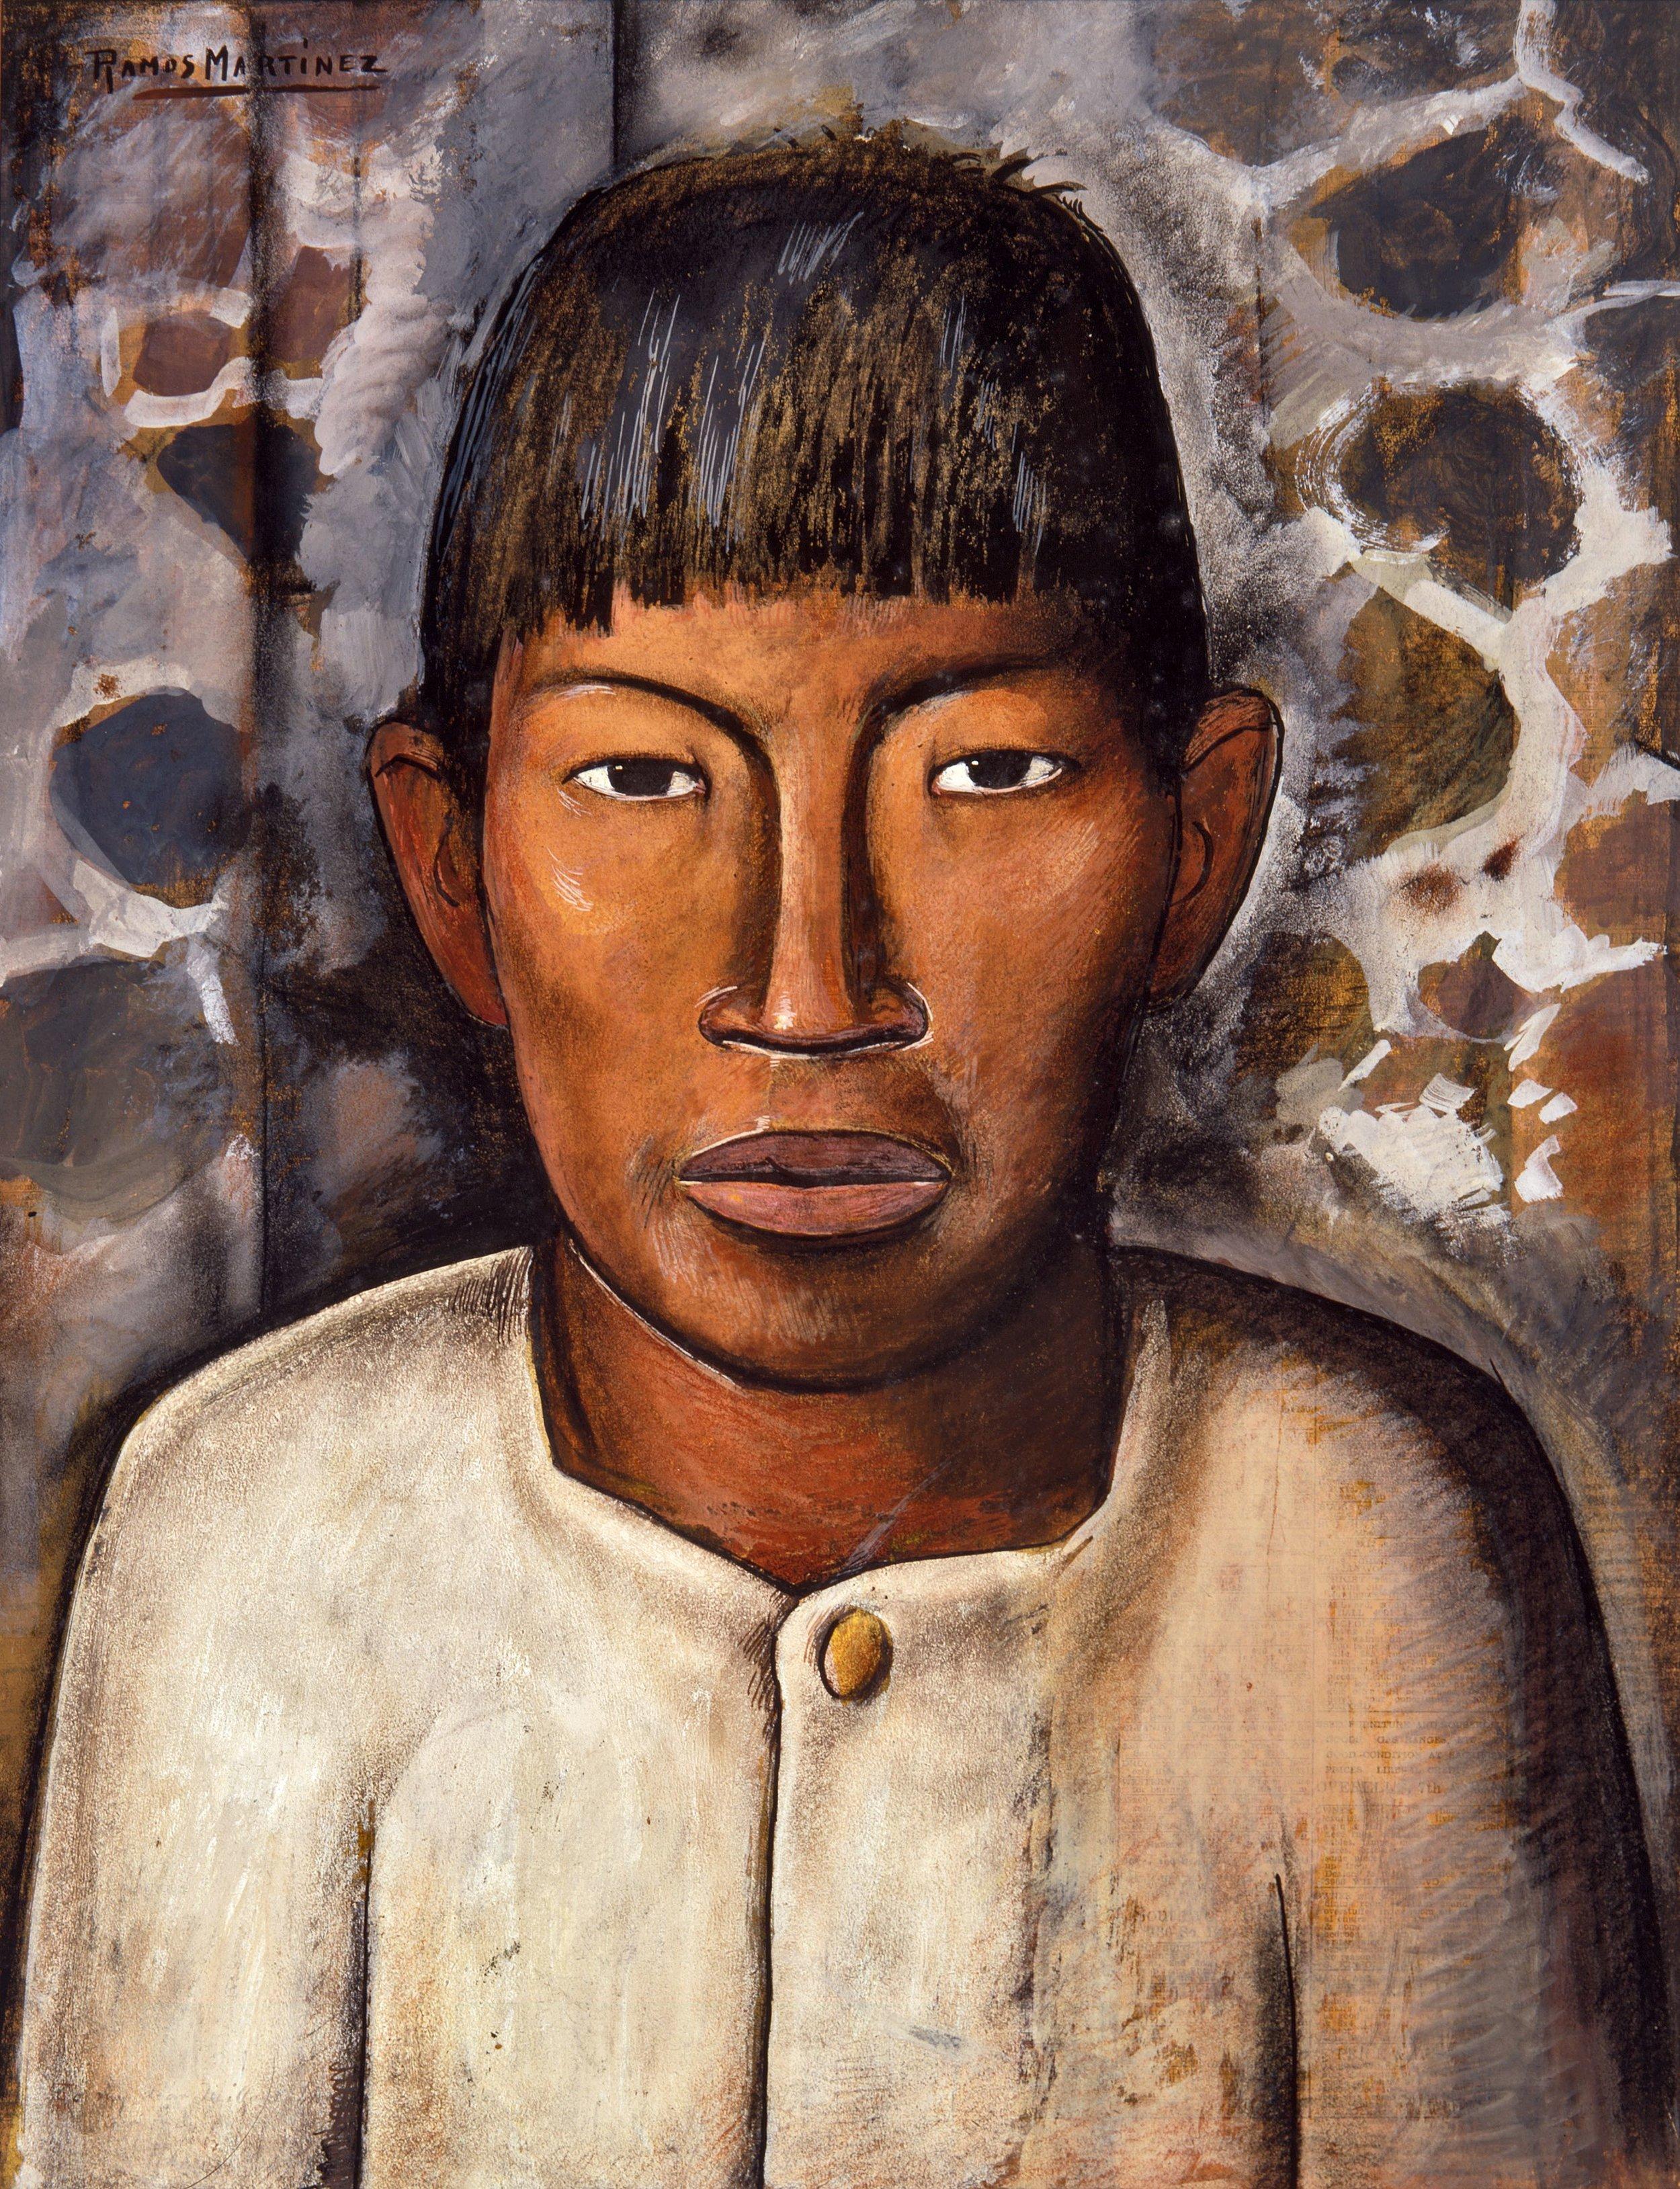 Muchacho Mexicano / Mexican Boy  ca. 1938 gouache and charcoal on newsprint / aguada y carbón sobre papel periódico 21.3 x 16.5 inches / 54 x 41.9 centímetros Private collection